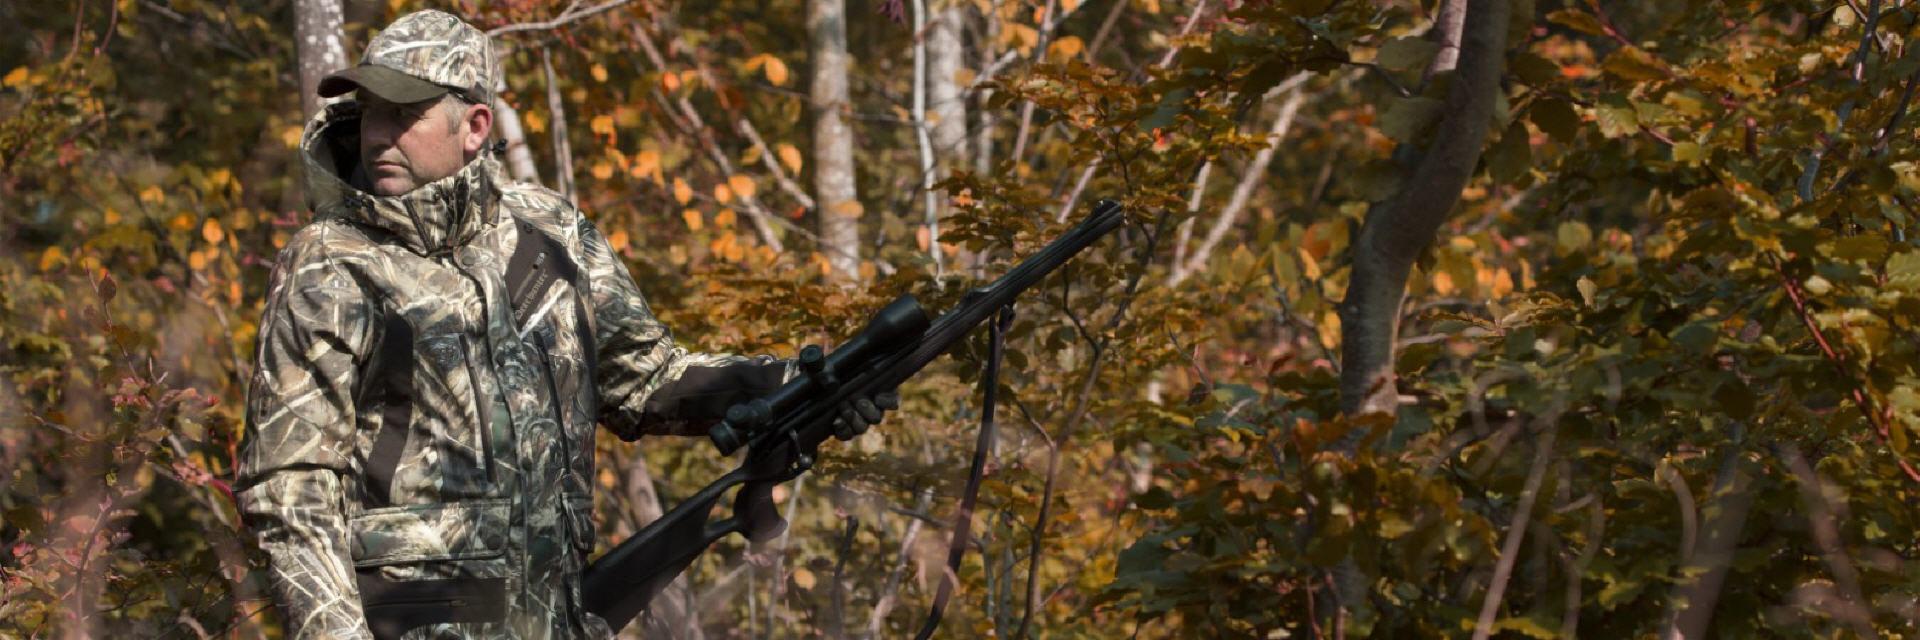 Frohe Weihnachten Jager.Deerhunter Bekleidung Fur Jagd U Outdoor Jagdjacken Jagdhosen Zubehor